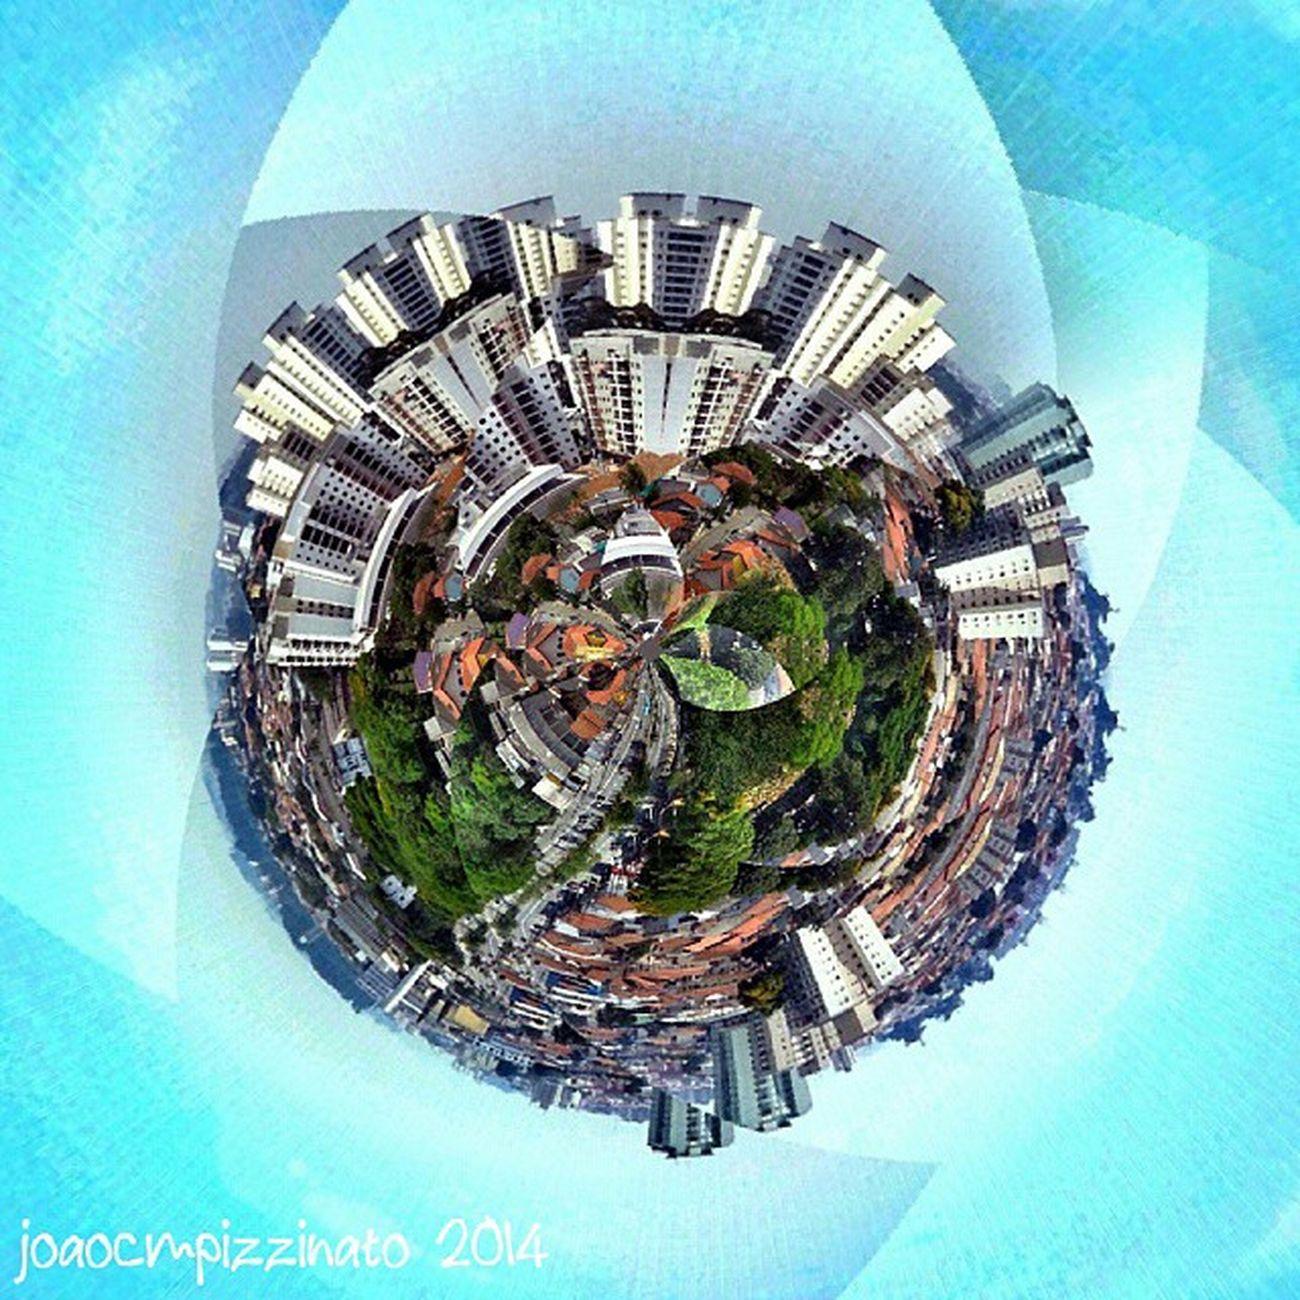 Planet. Tinyplanetfx Edited Effect Colors city zonasul saopaulo brasil photography